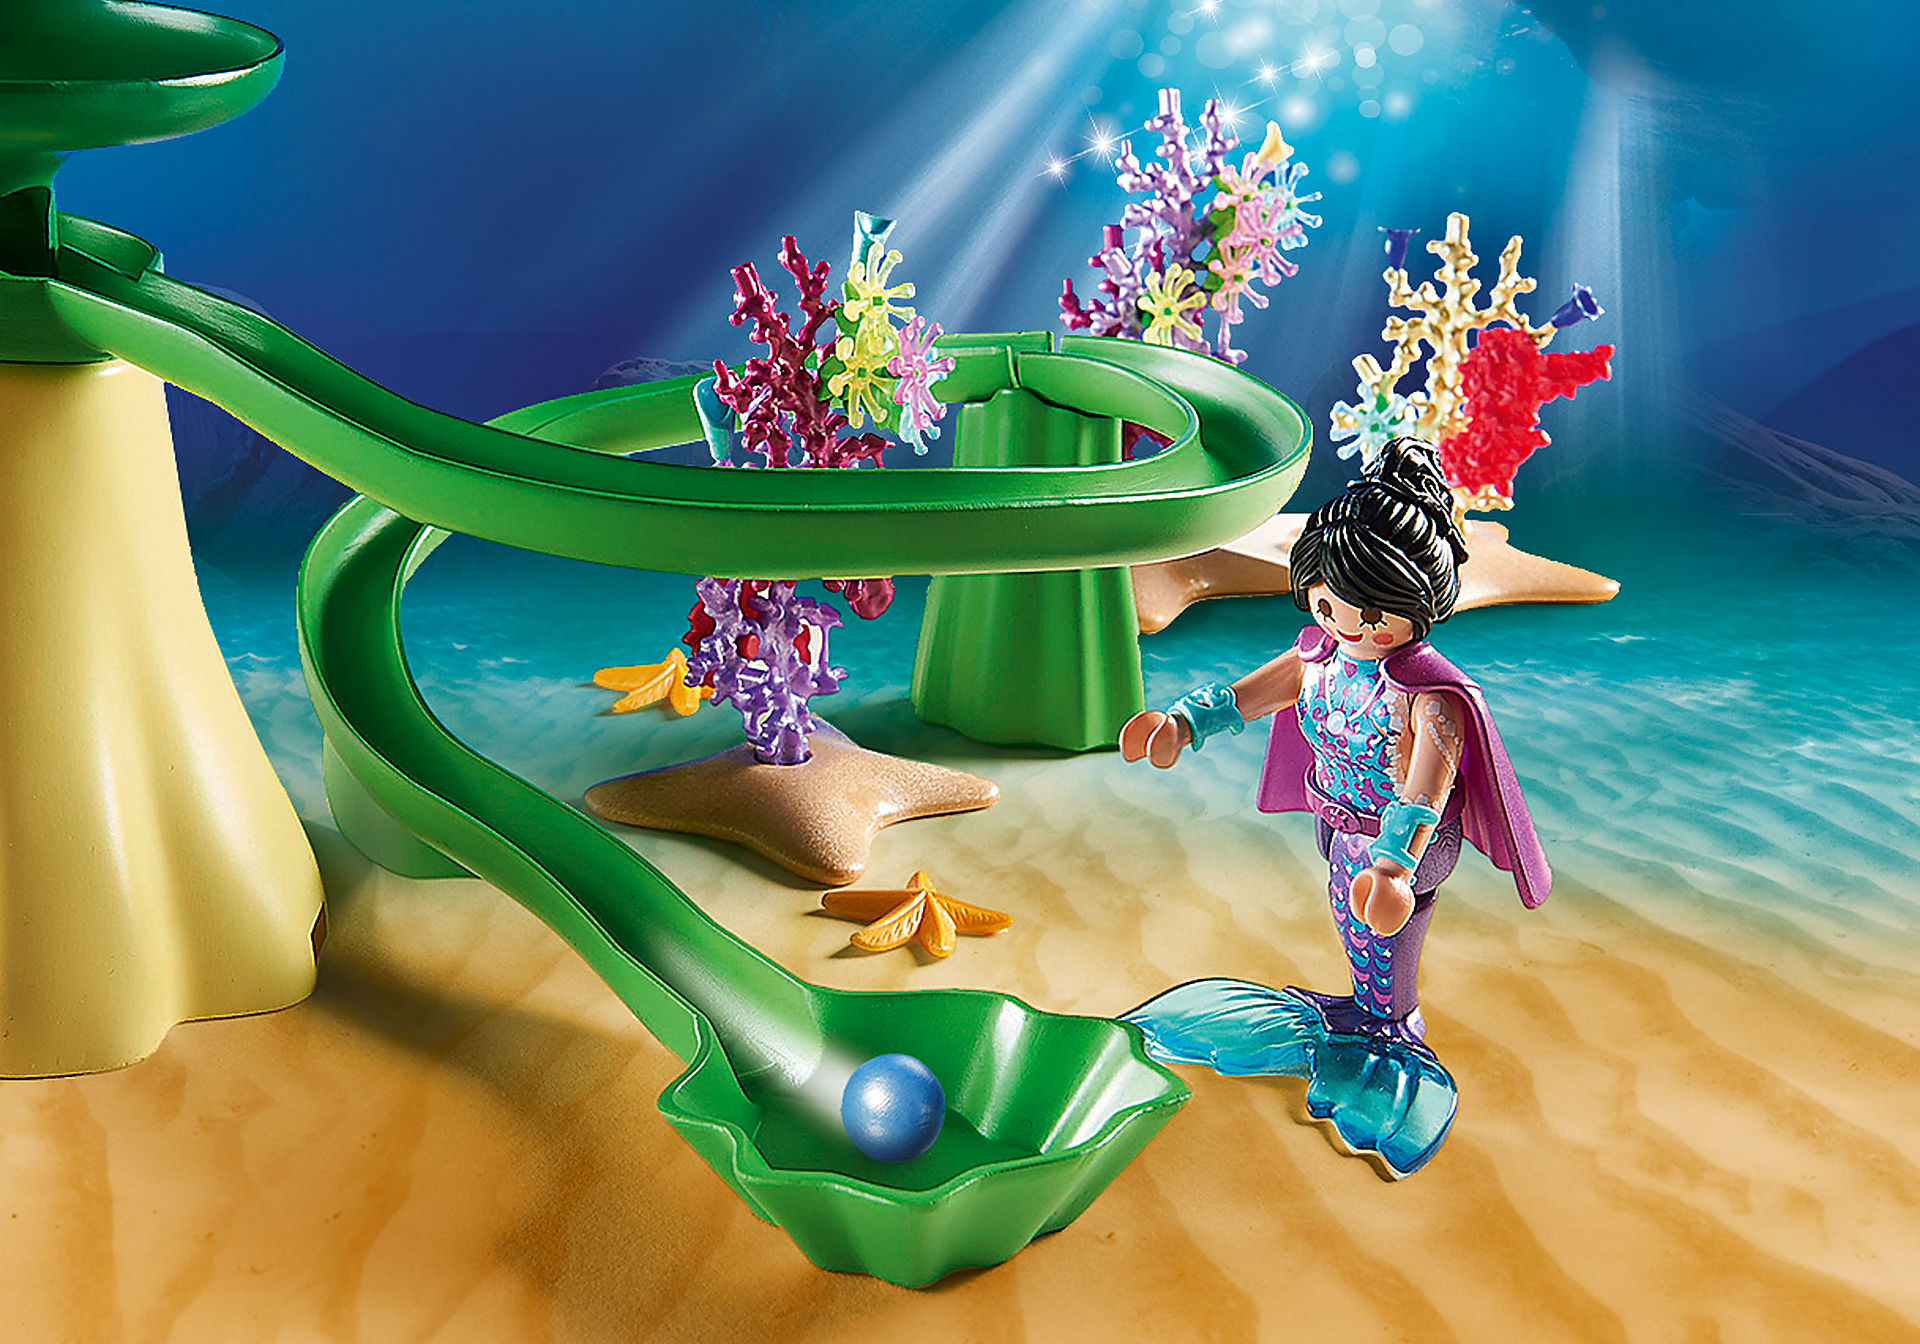 70094 Cala de Sirenas con Cúpula Iluminada zoom image6